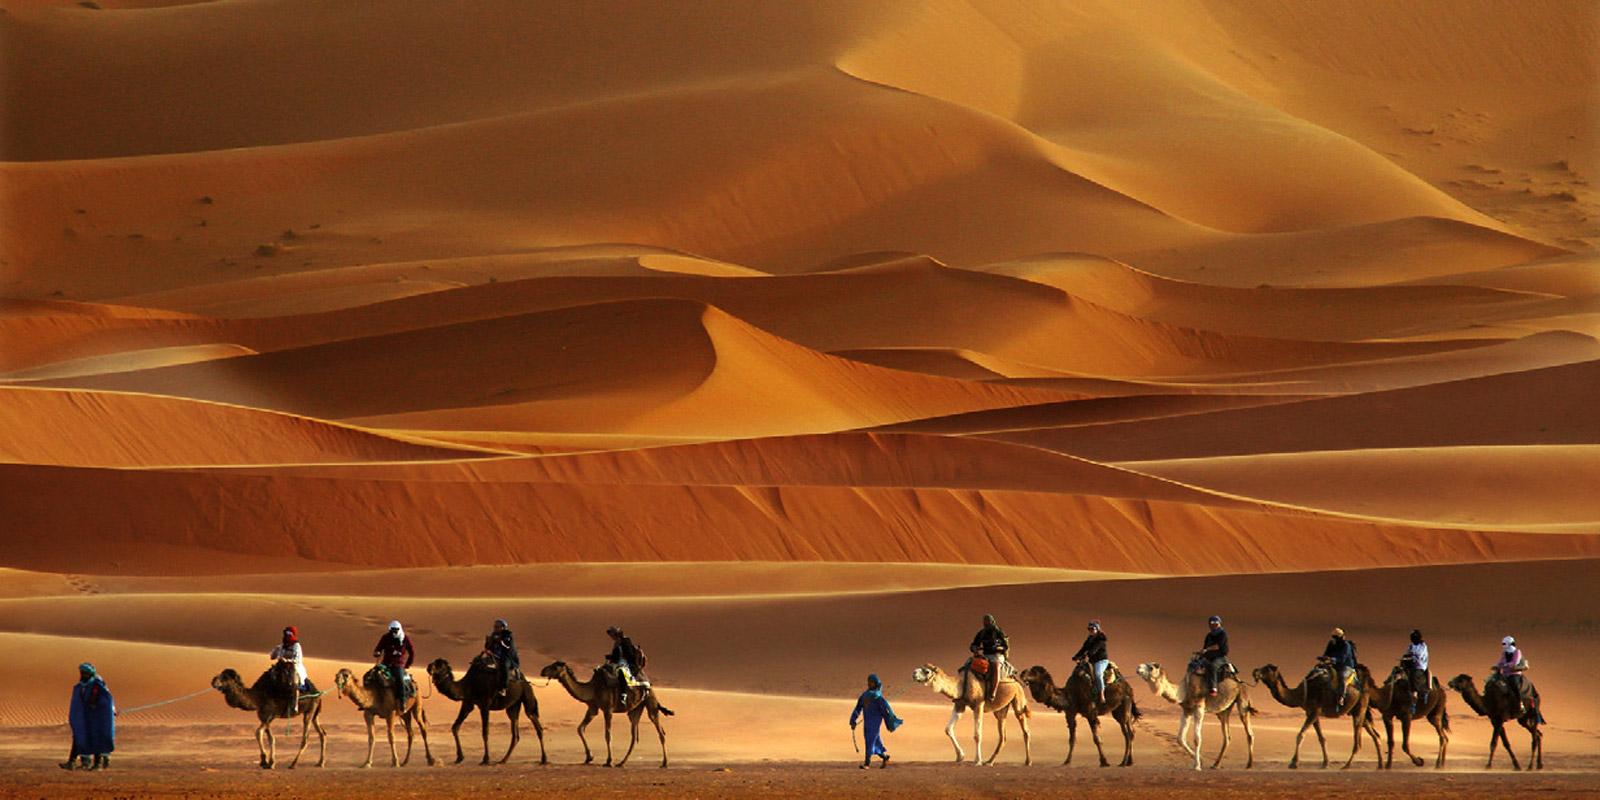 Marokko Magie des Orients